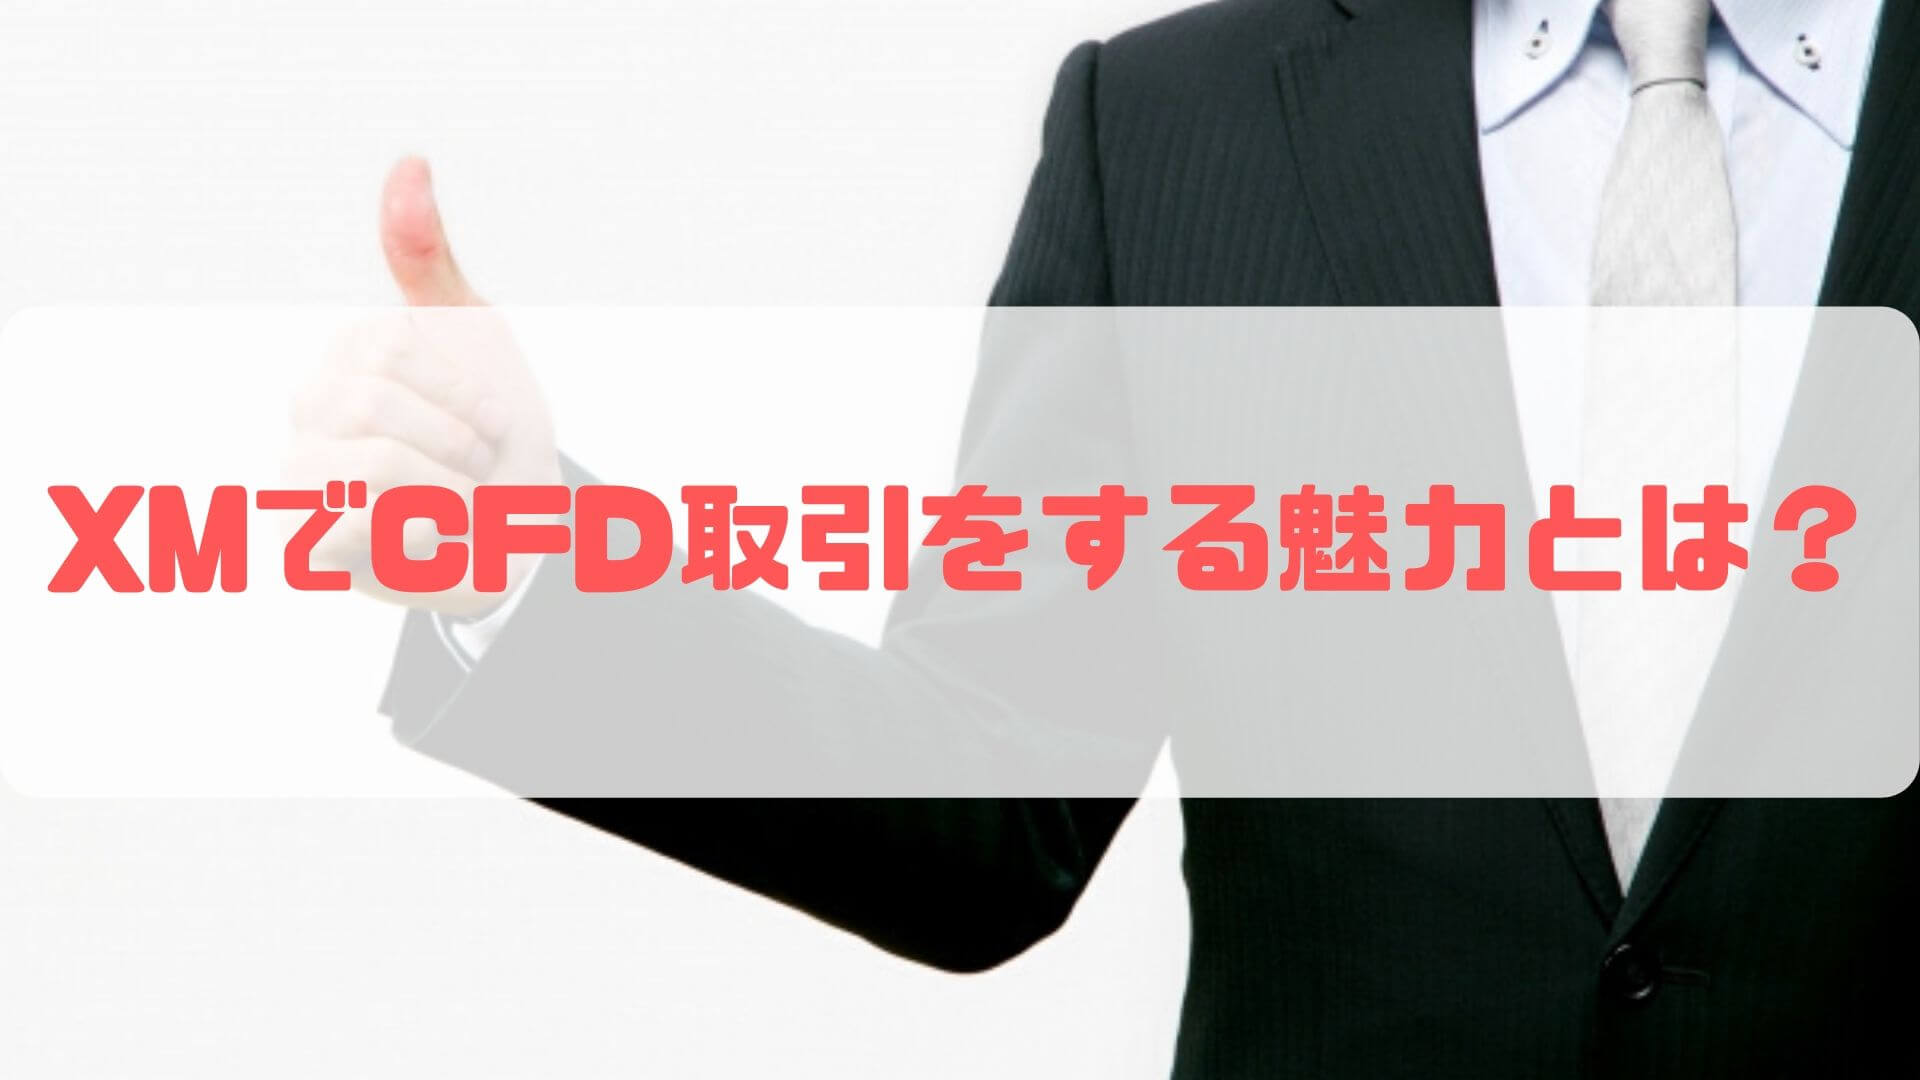 XM CFD